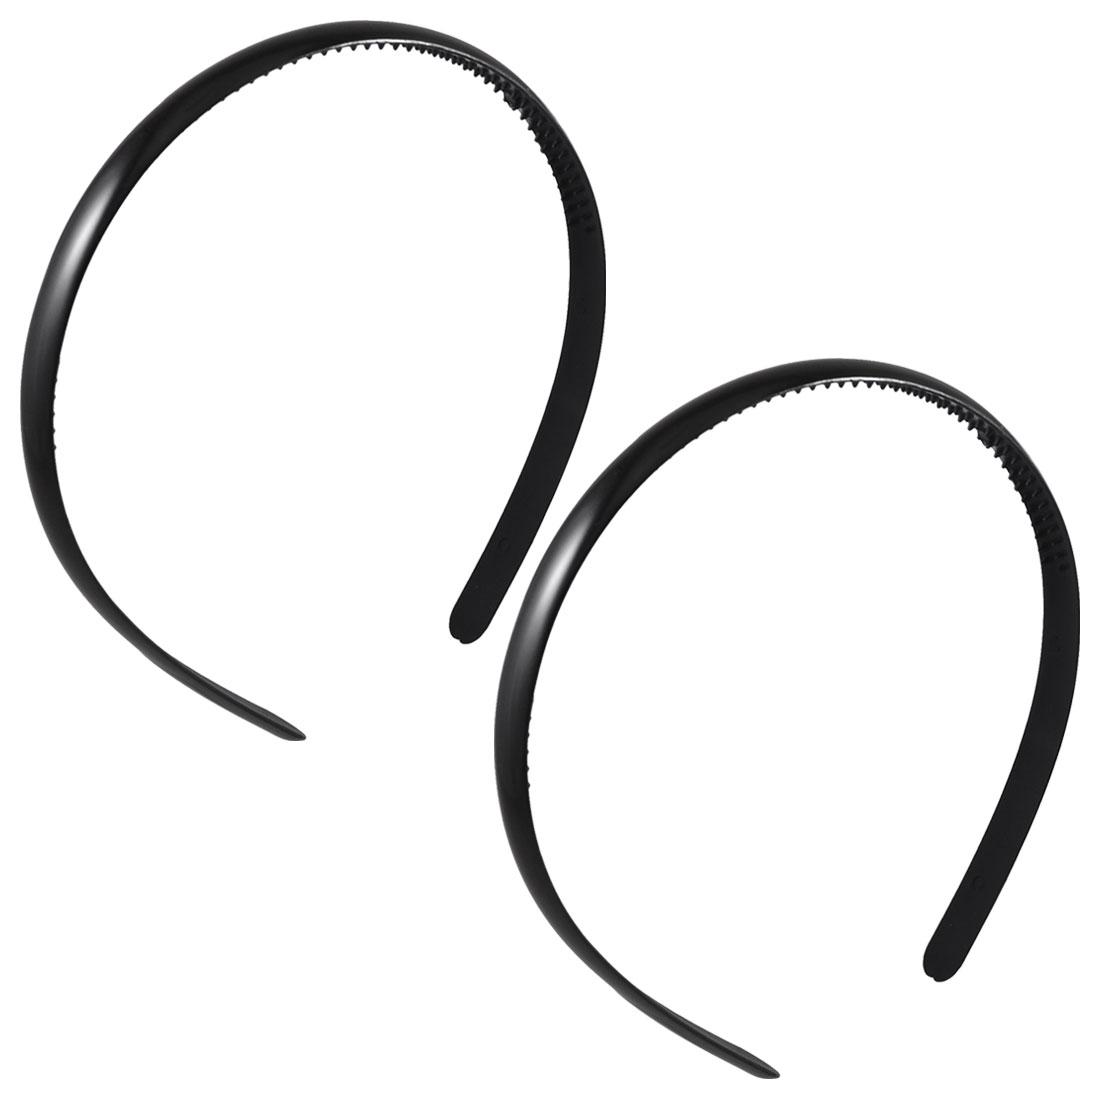 "2 Pcs Black 0.4"" Width Plastic Frame Dual Row Teeth Hair Headwear Hoop Head Band for Girls"